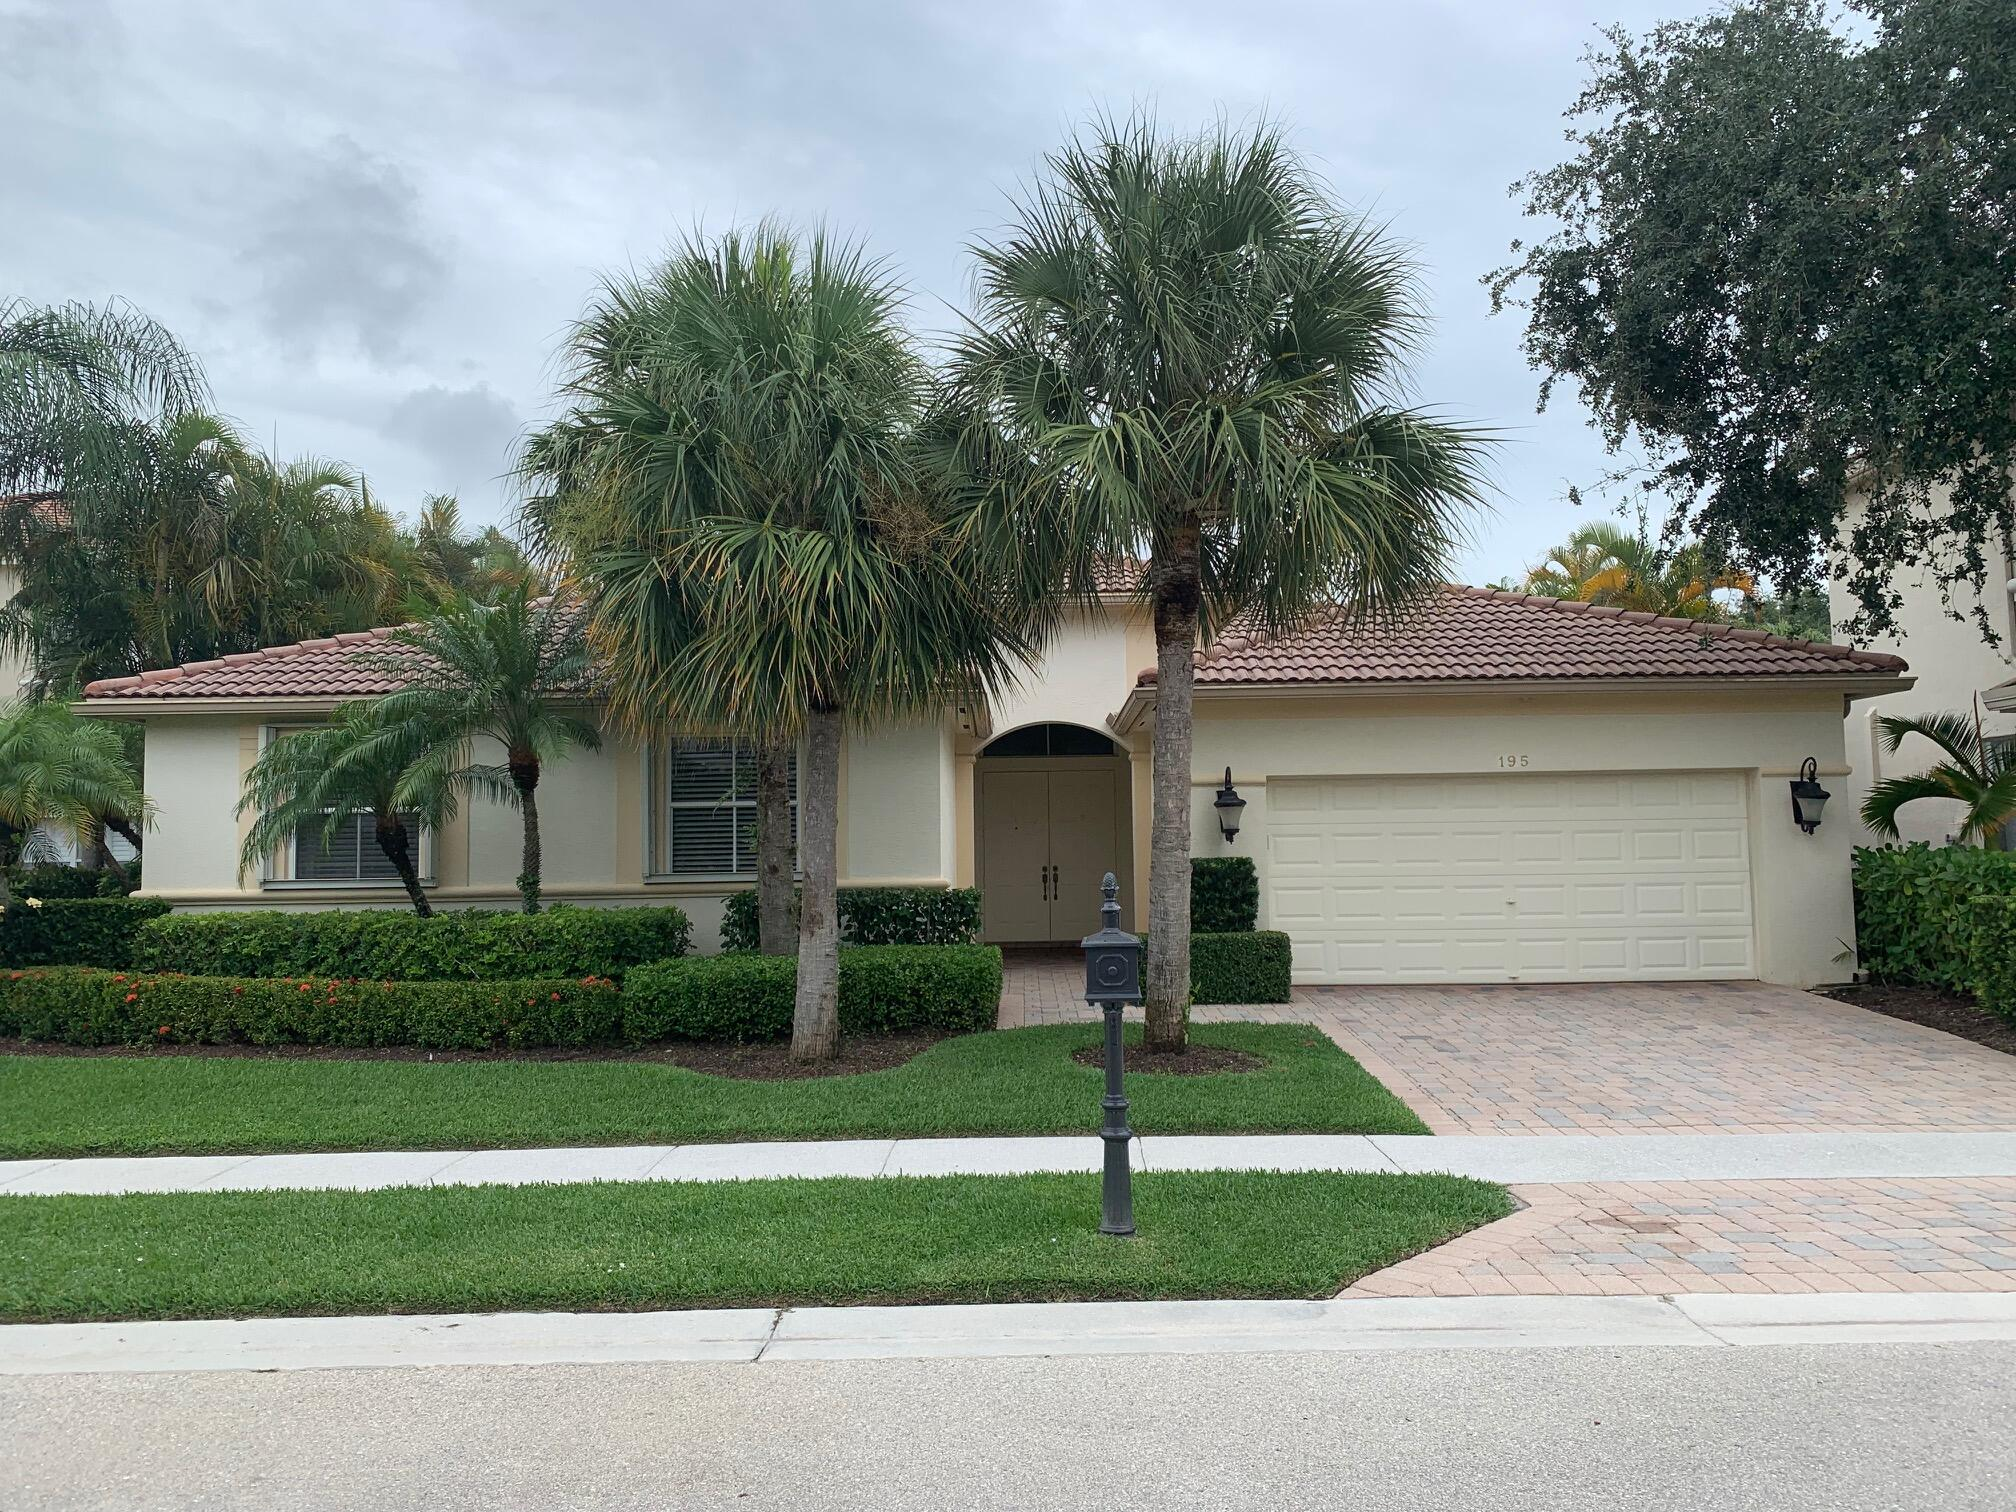 195 Sedona Way, Palm Beach Gardens, FL 33418